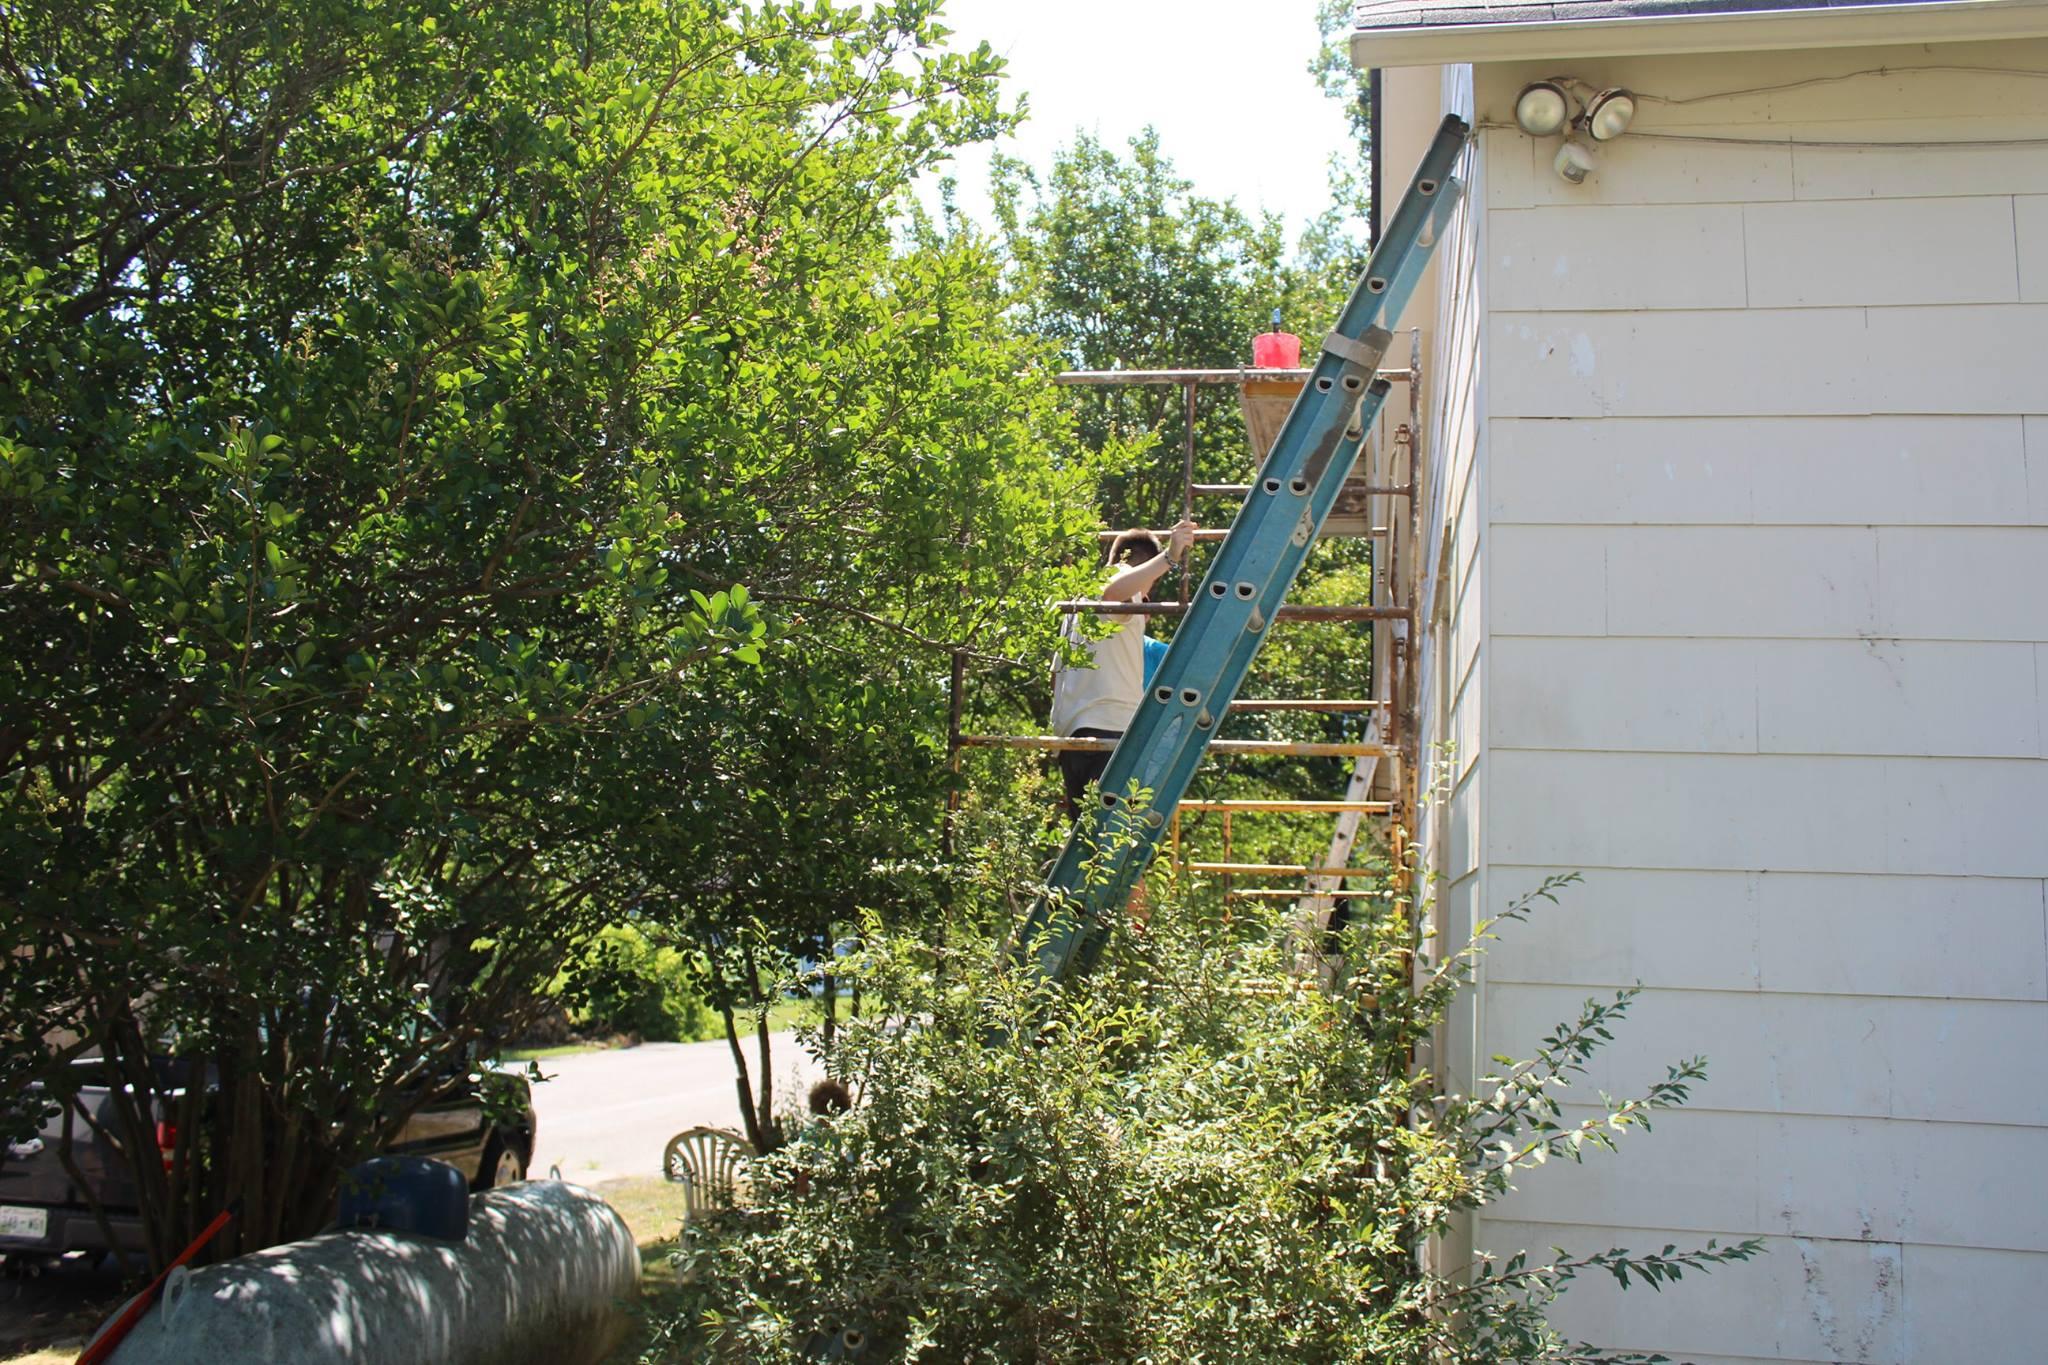 Chattanooga2016_06.29.16_WH_07.jpg